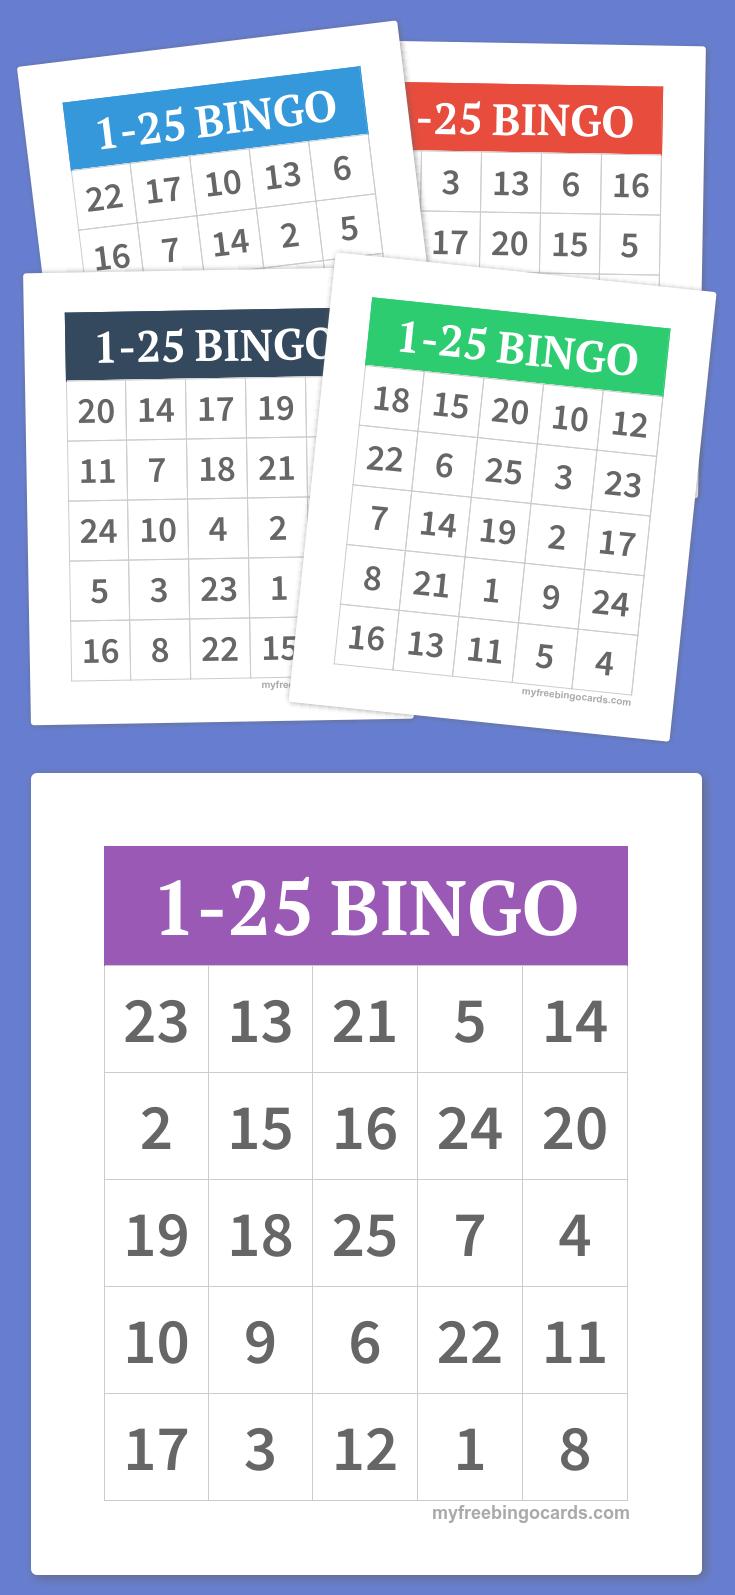 1-25 Bingo | Bingo Cards Printable, Free Printable Bingo